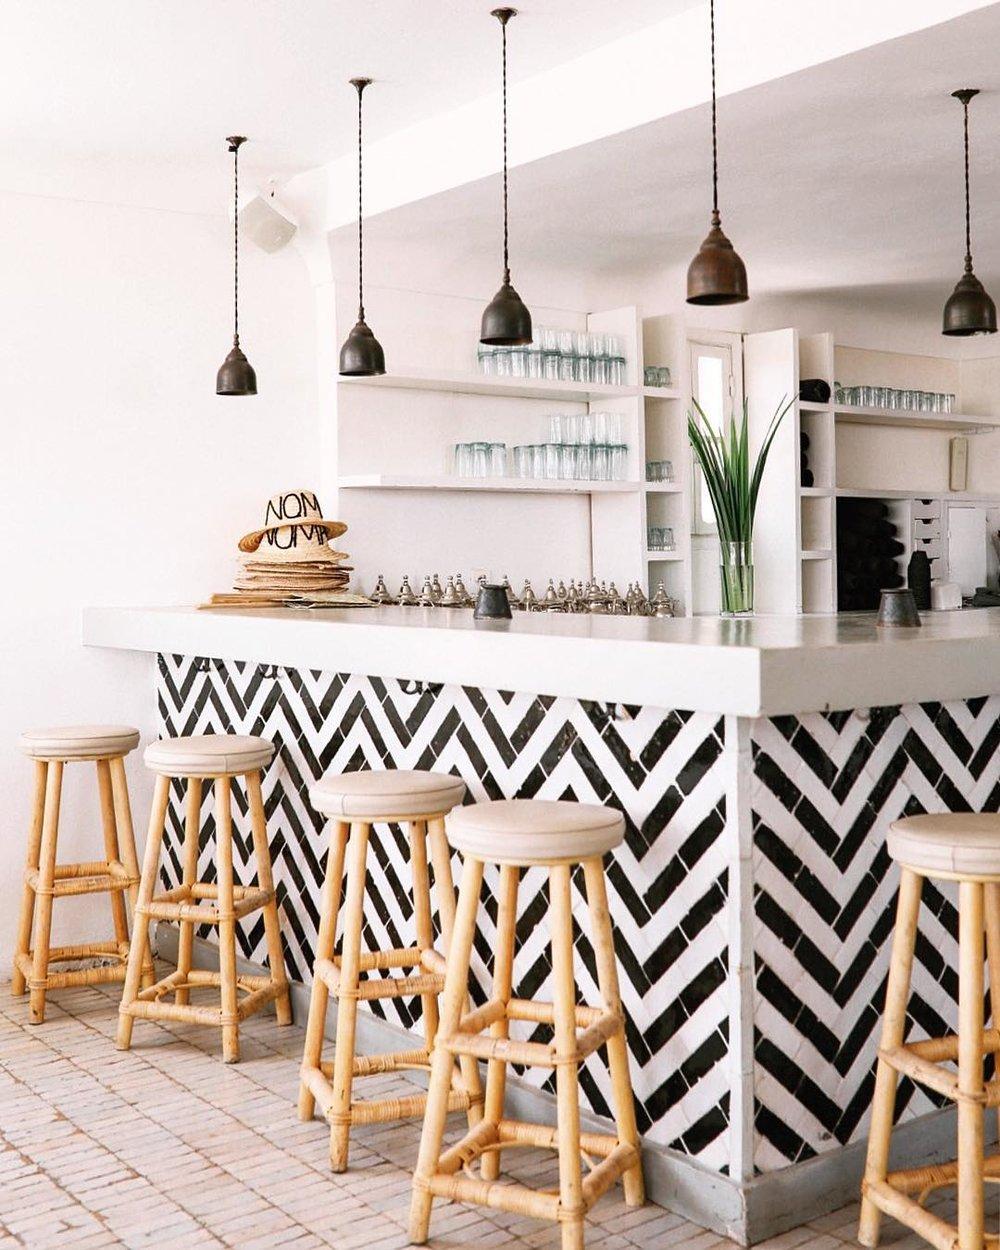 Beautiful tiling at  @nomadmarrakech